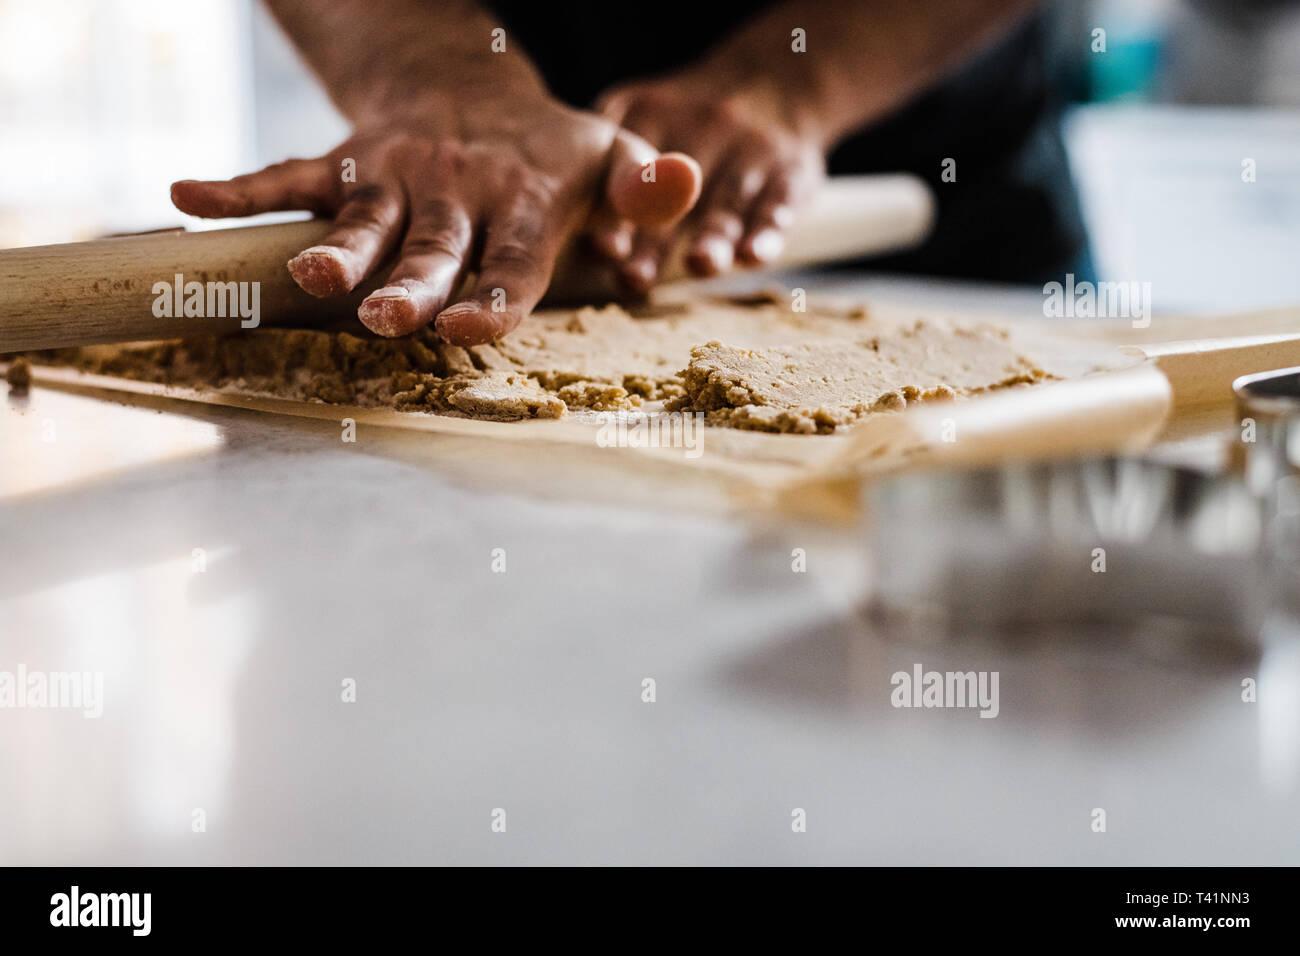 Man's hands rolling dough - Stock Image